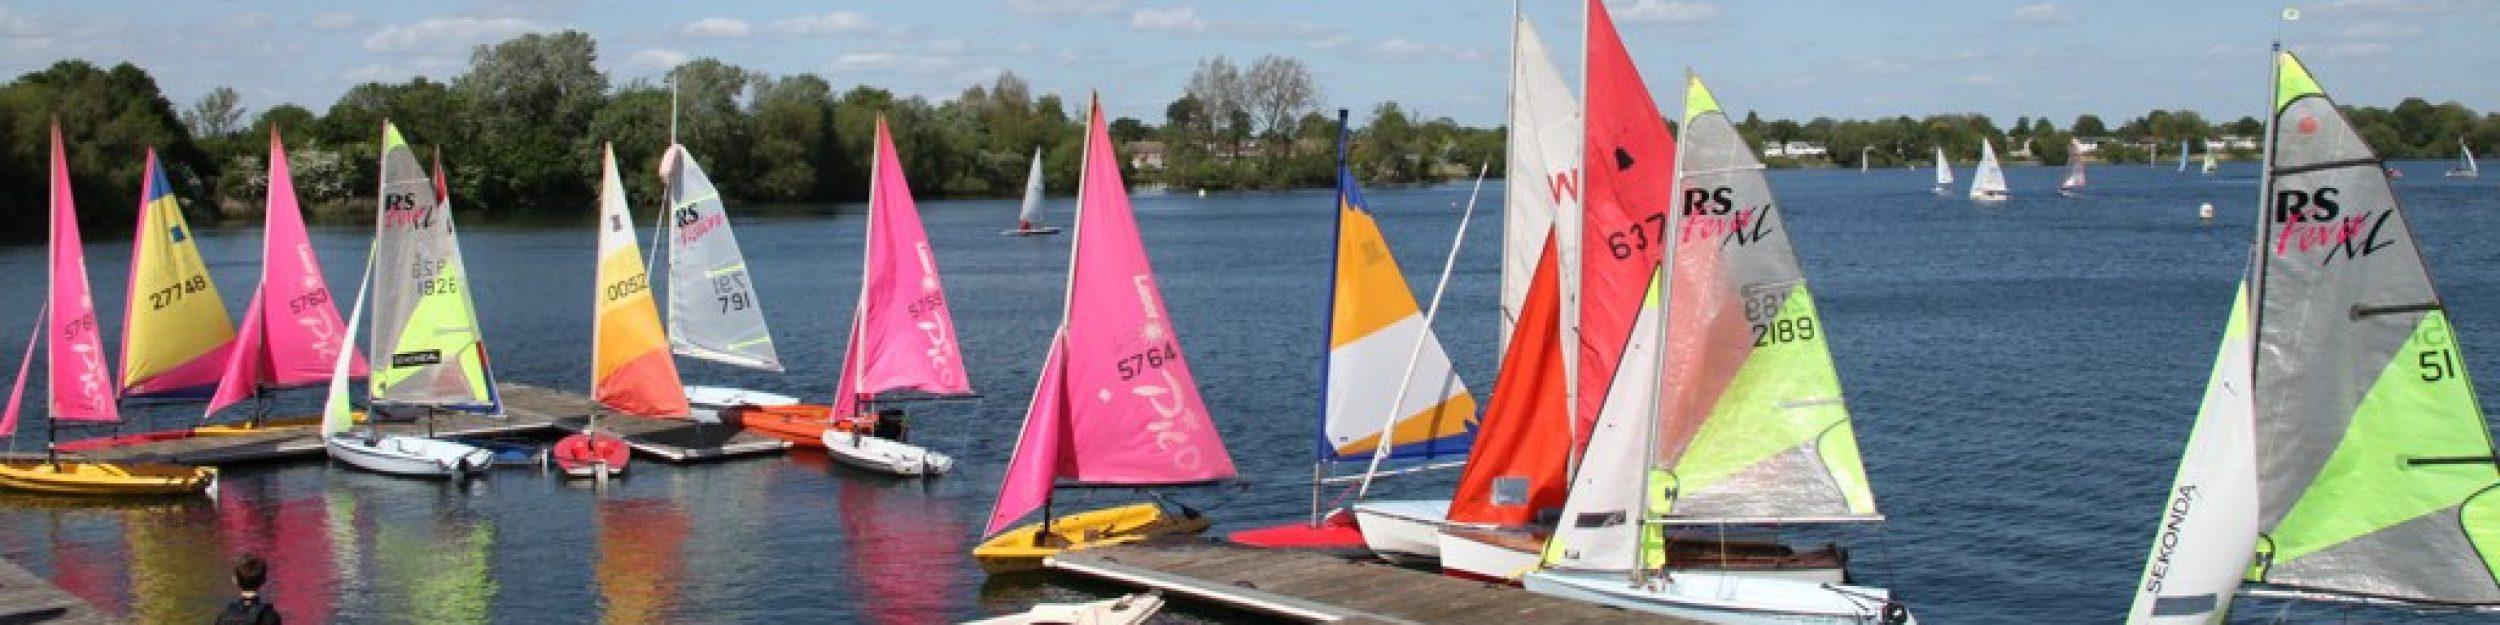 Littleton Sailing Club